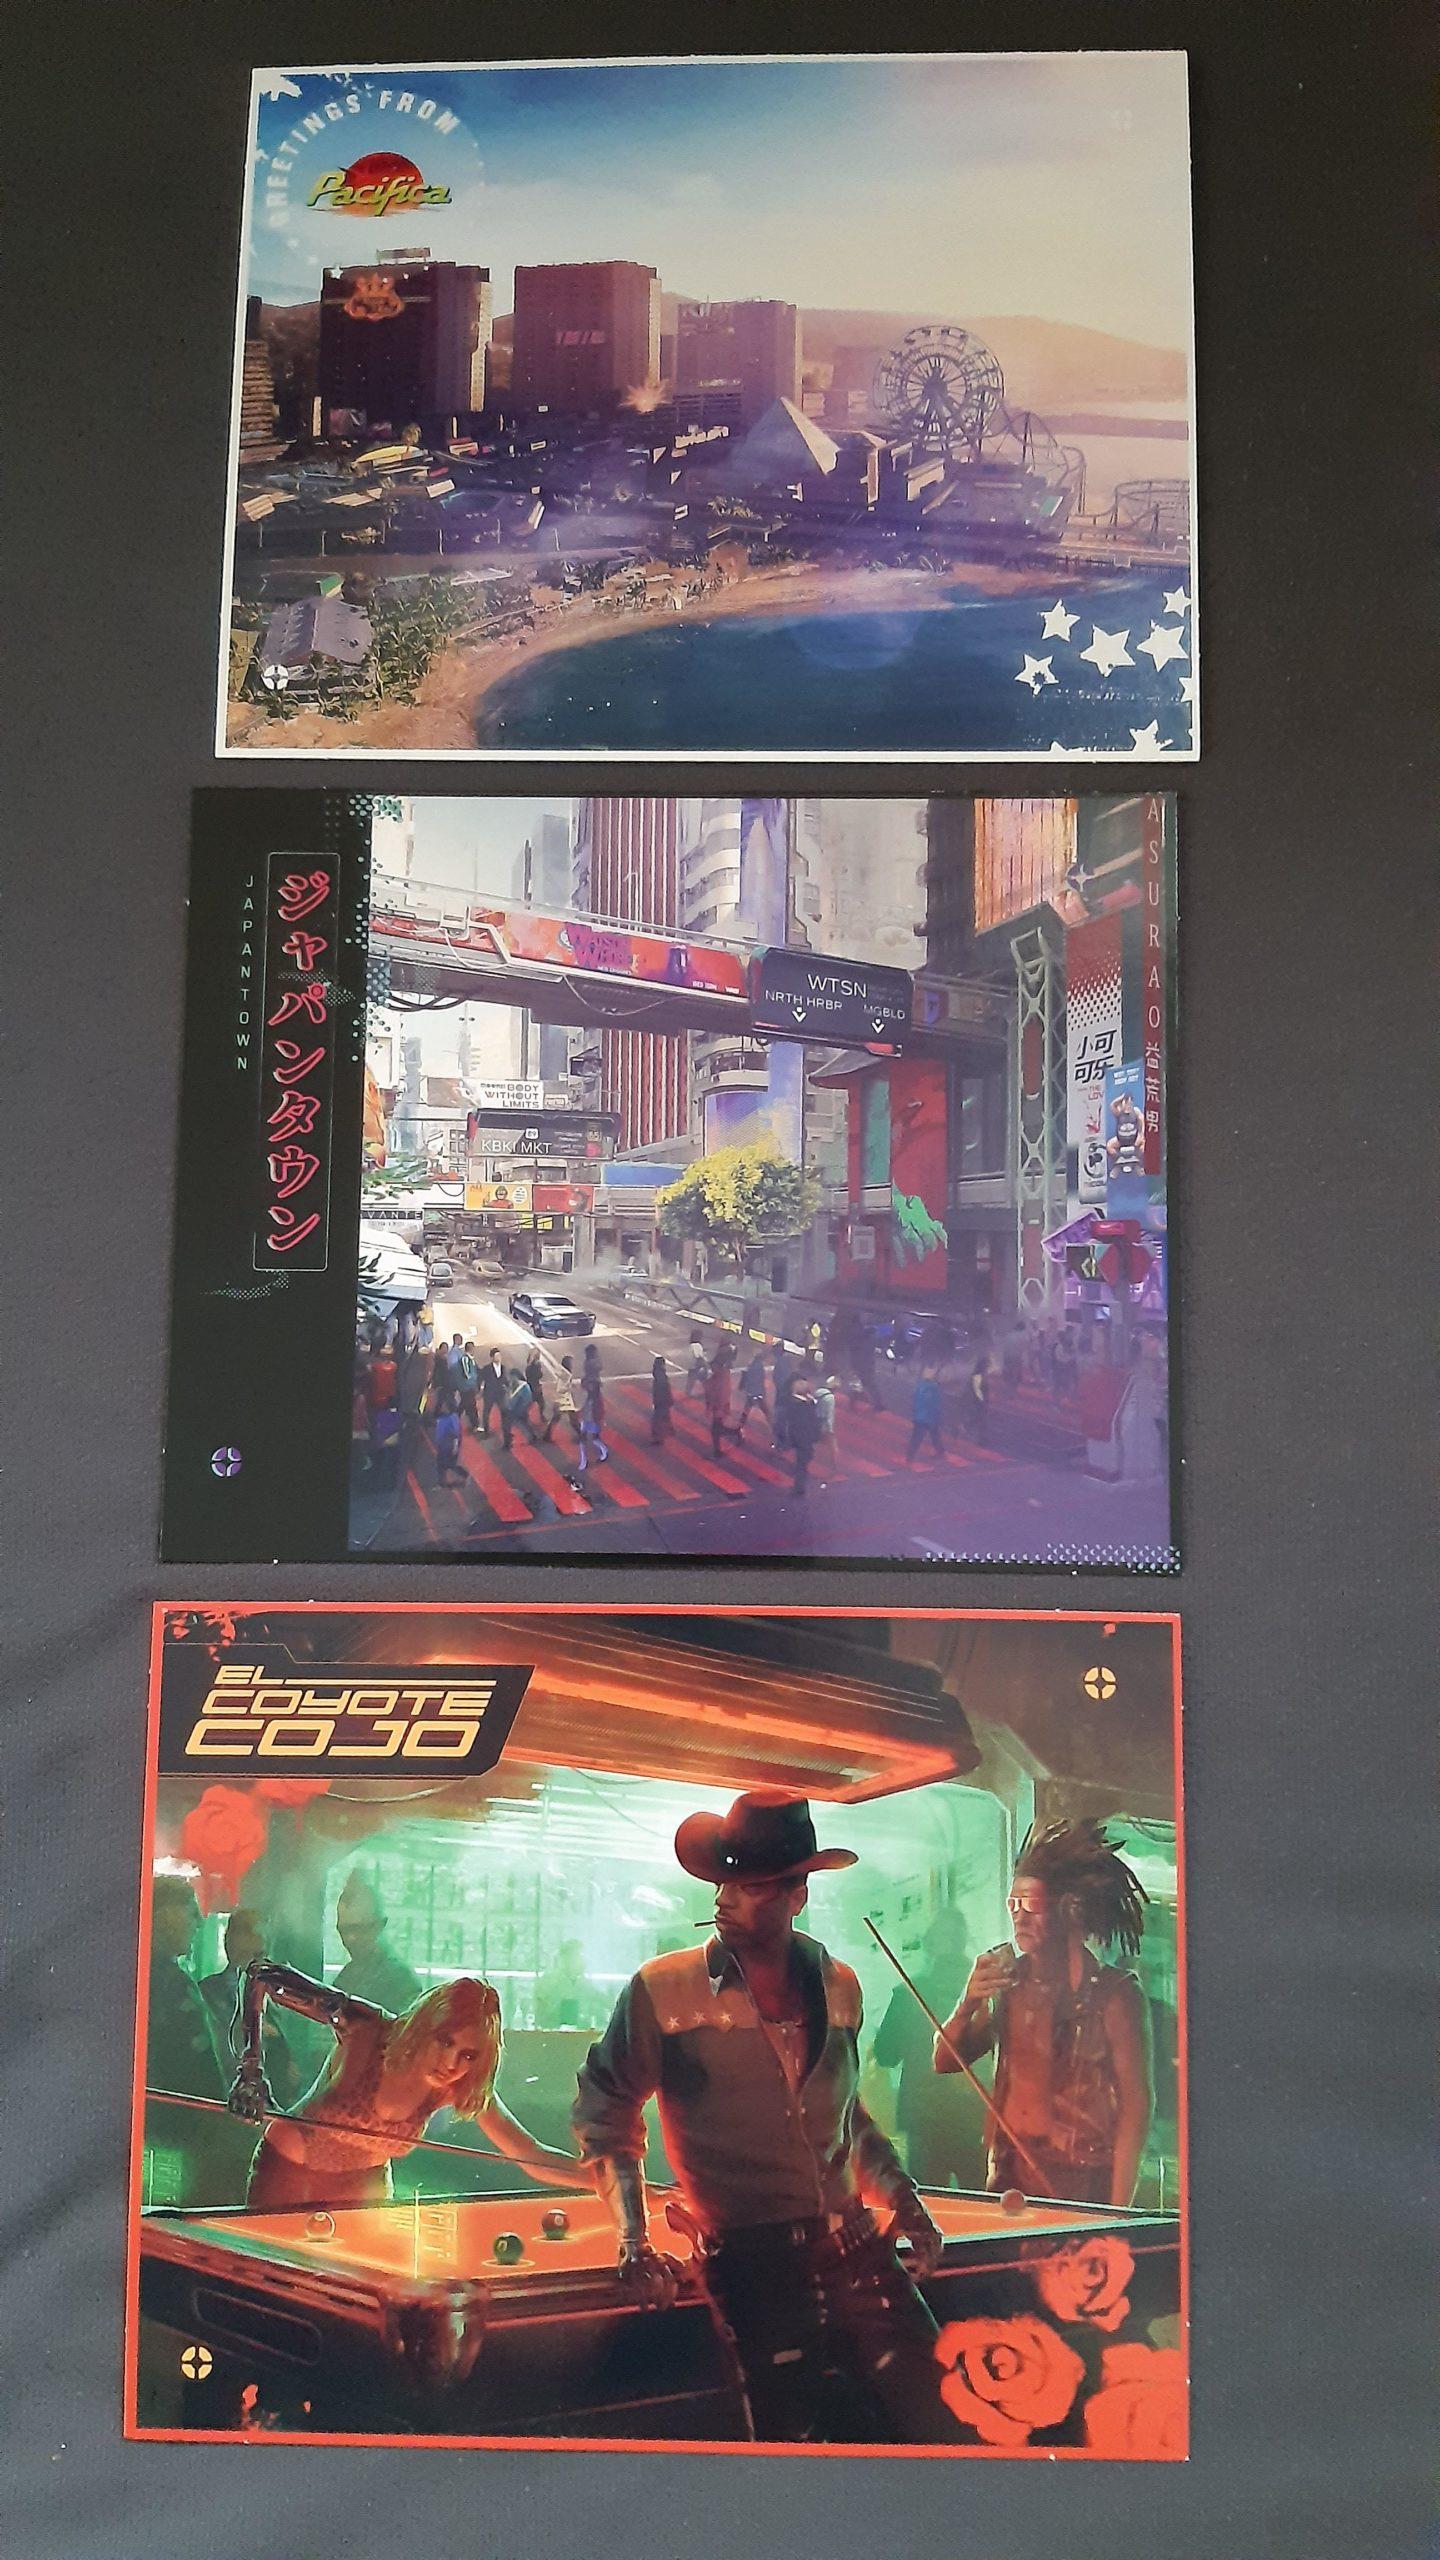 Cartes postales Cyberpunk 2077